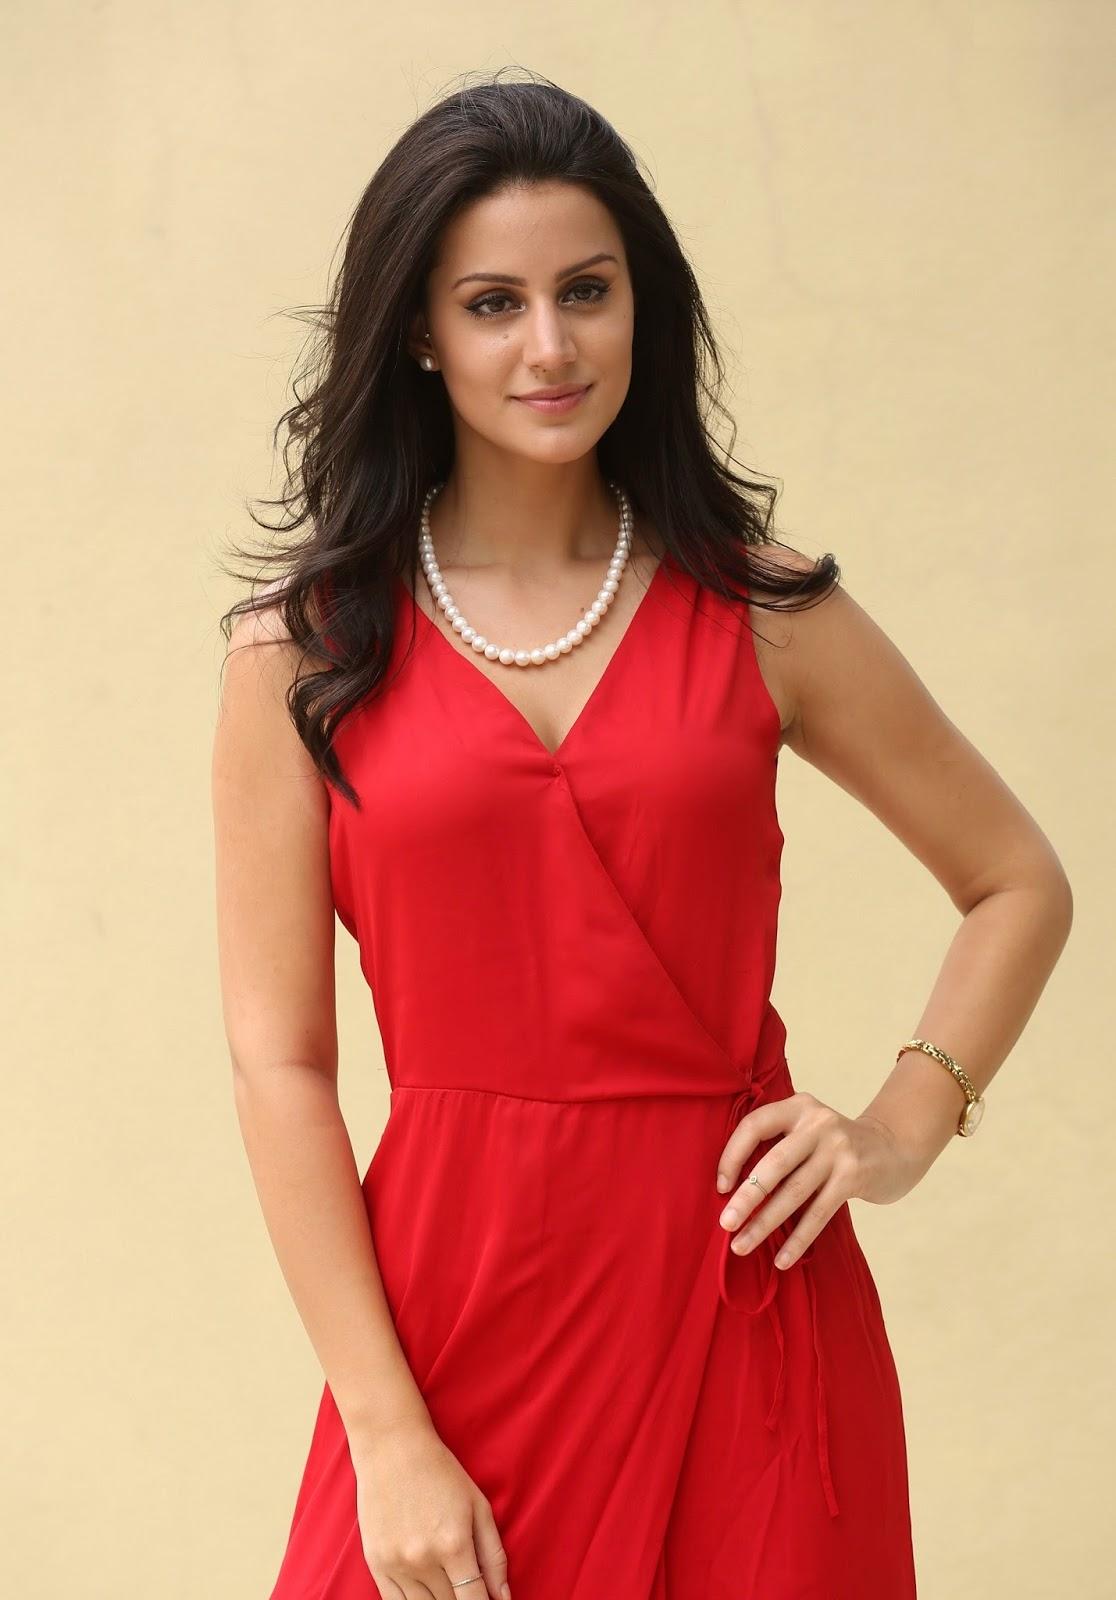 Kamapichachi No Wear Dress Brazilian Beauty Larissa Bonesi Looks Super Sexy In Red